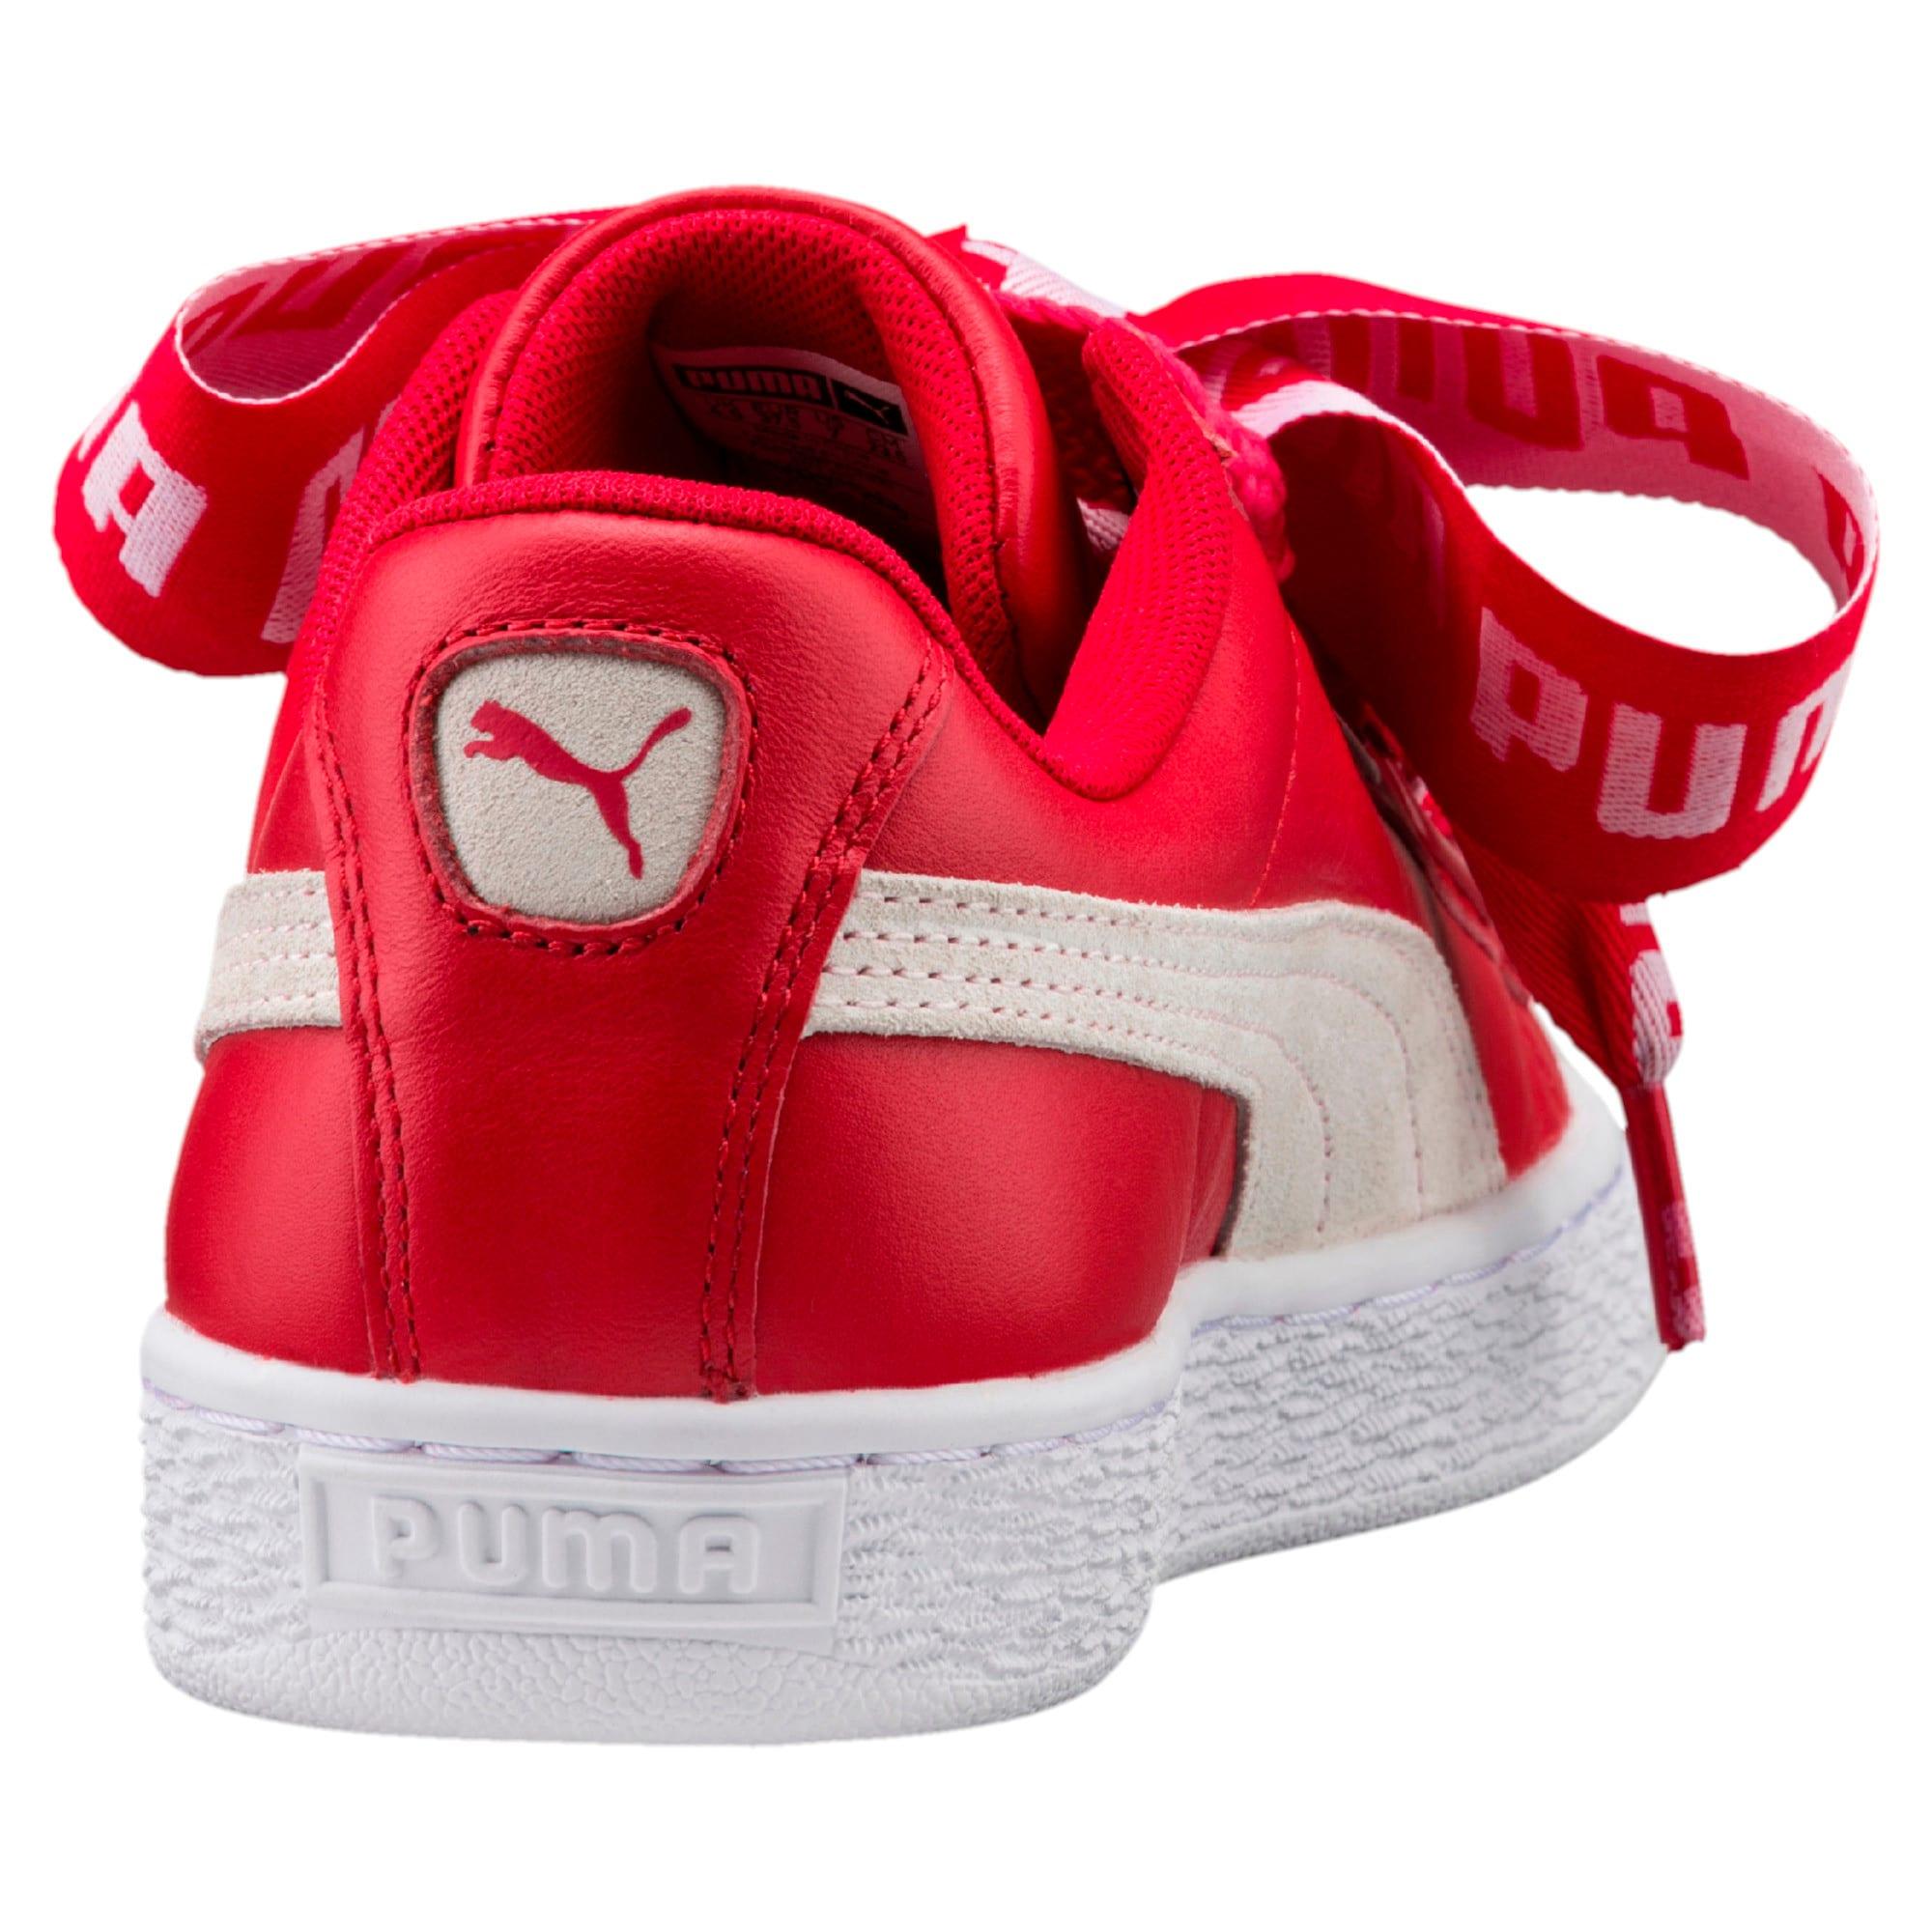 Thumbnail 5 of Basket Heart DE Women's Trainers, Toreador-Puma White, medium-IND